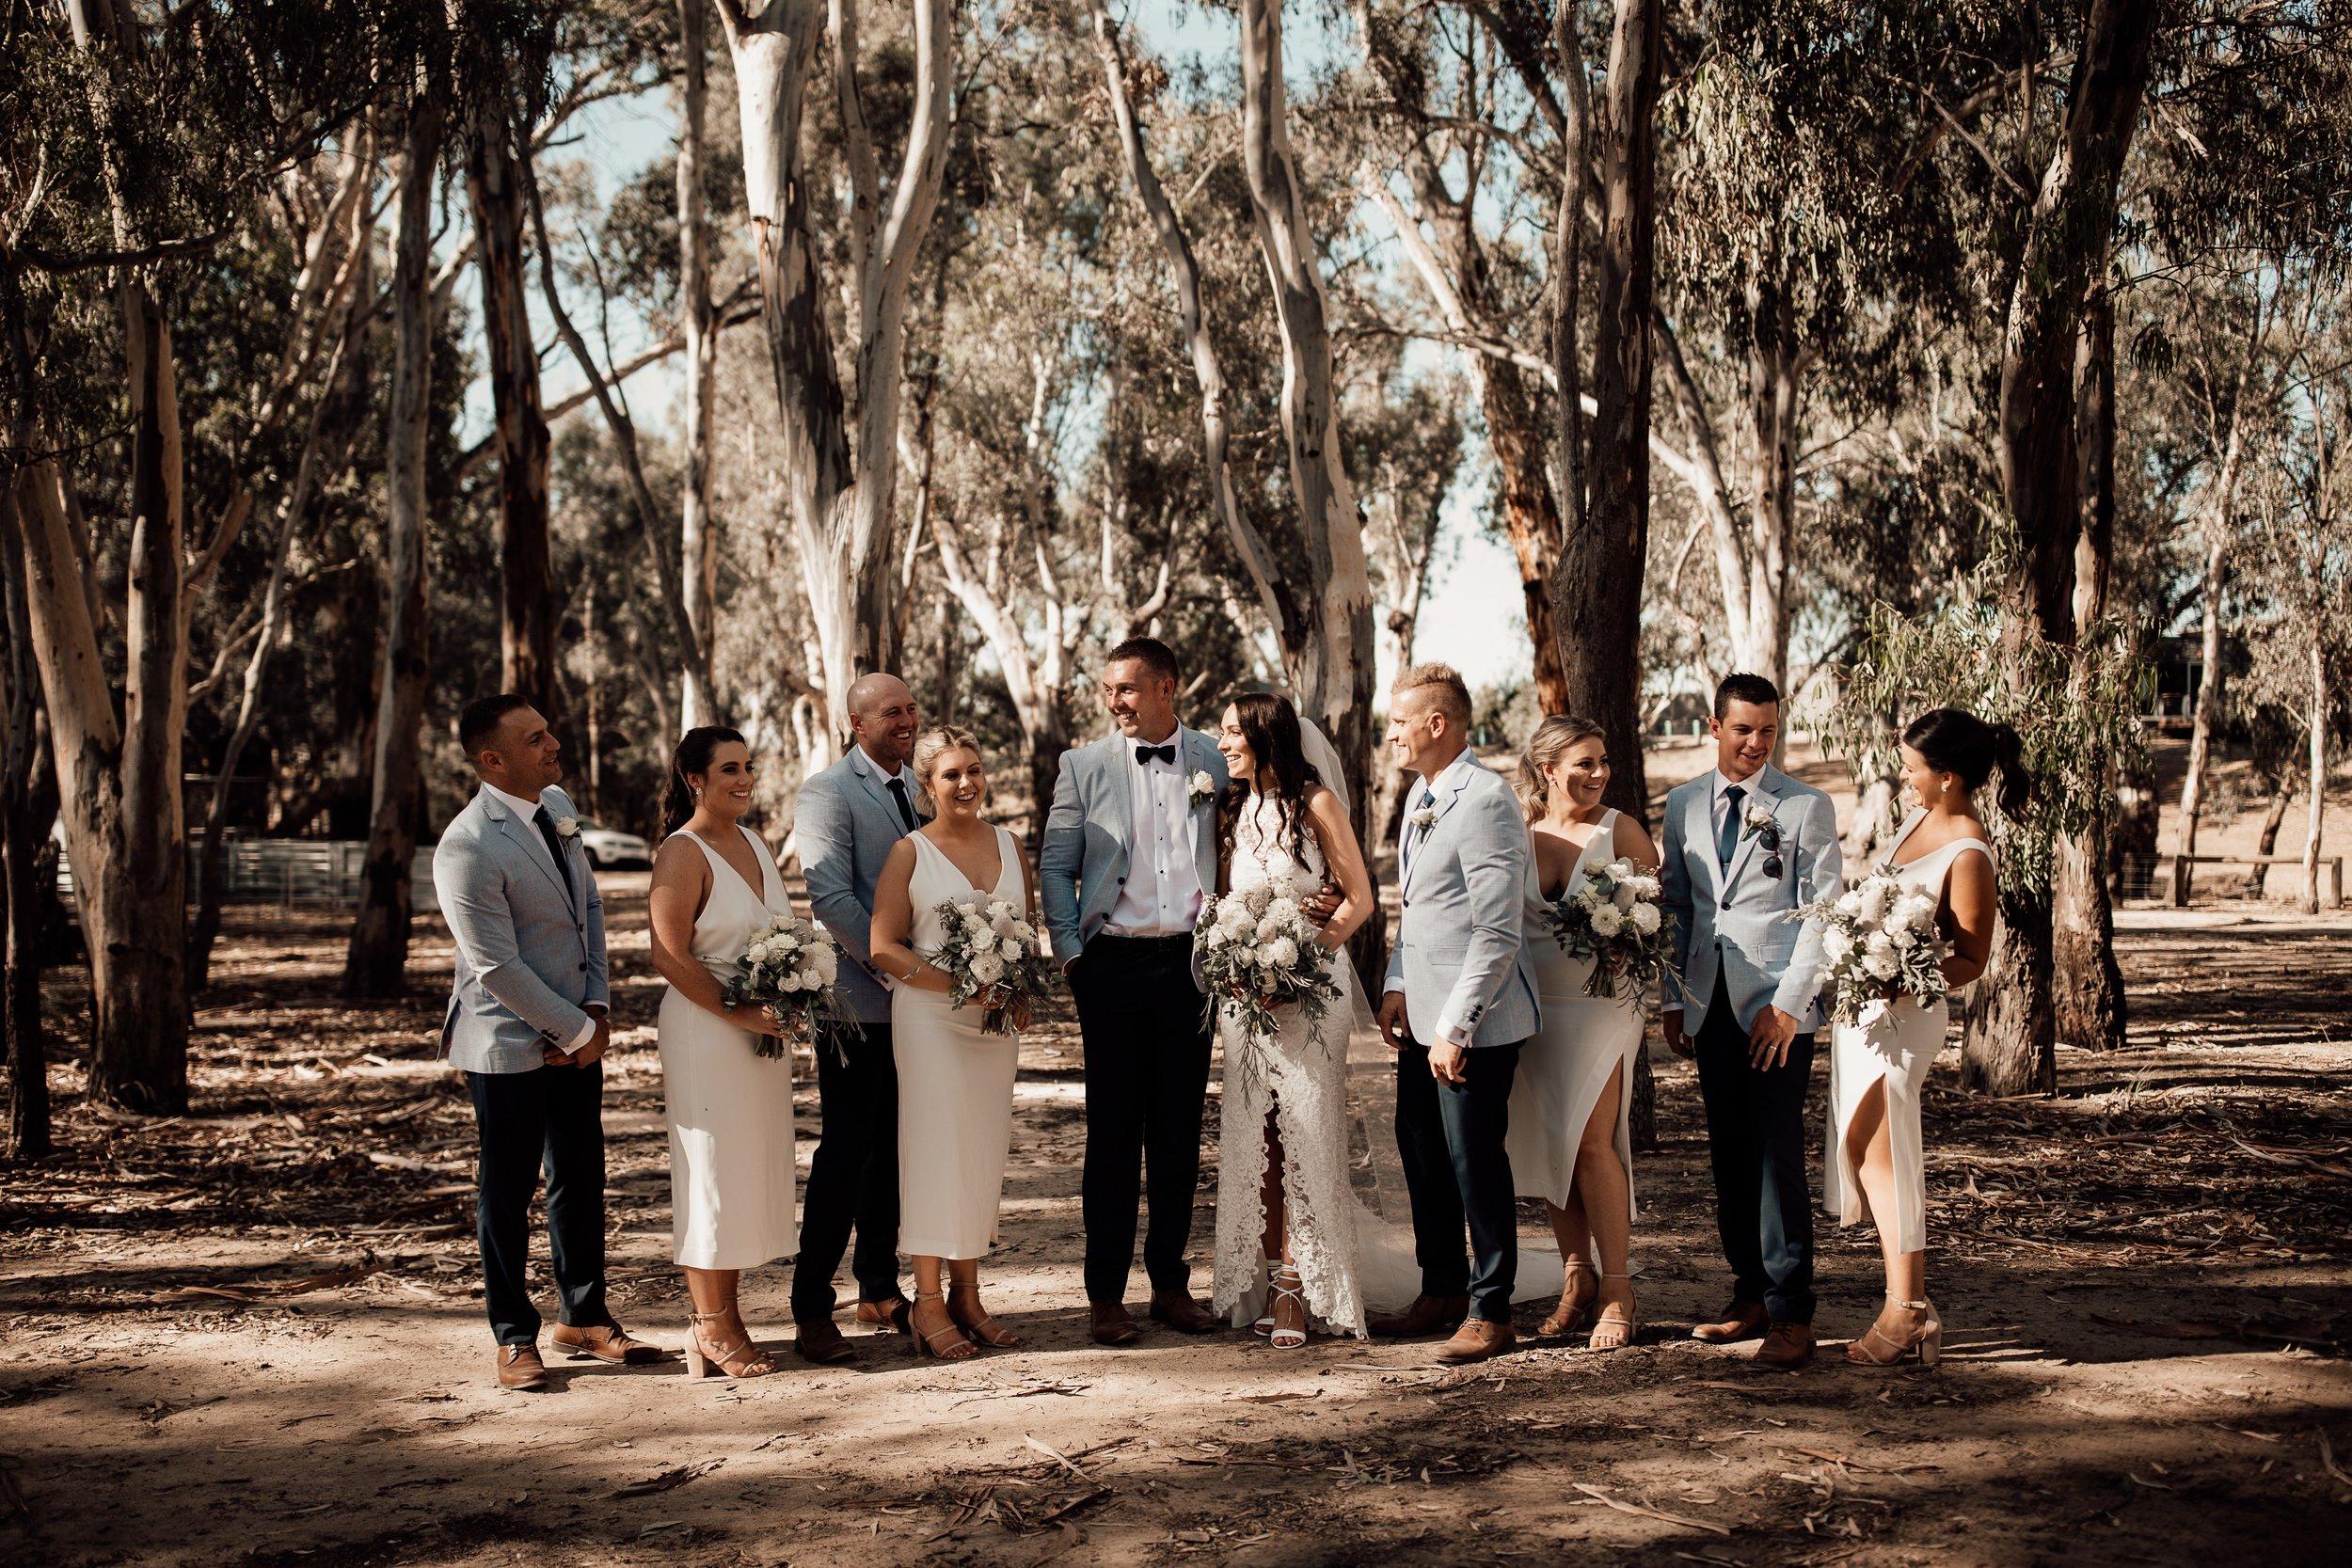 mickalathomas_puremacphotography_weddingphotographer_couplephotographer_Sheppartonphotographer_1478.jpg